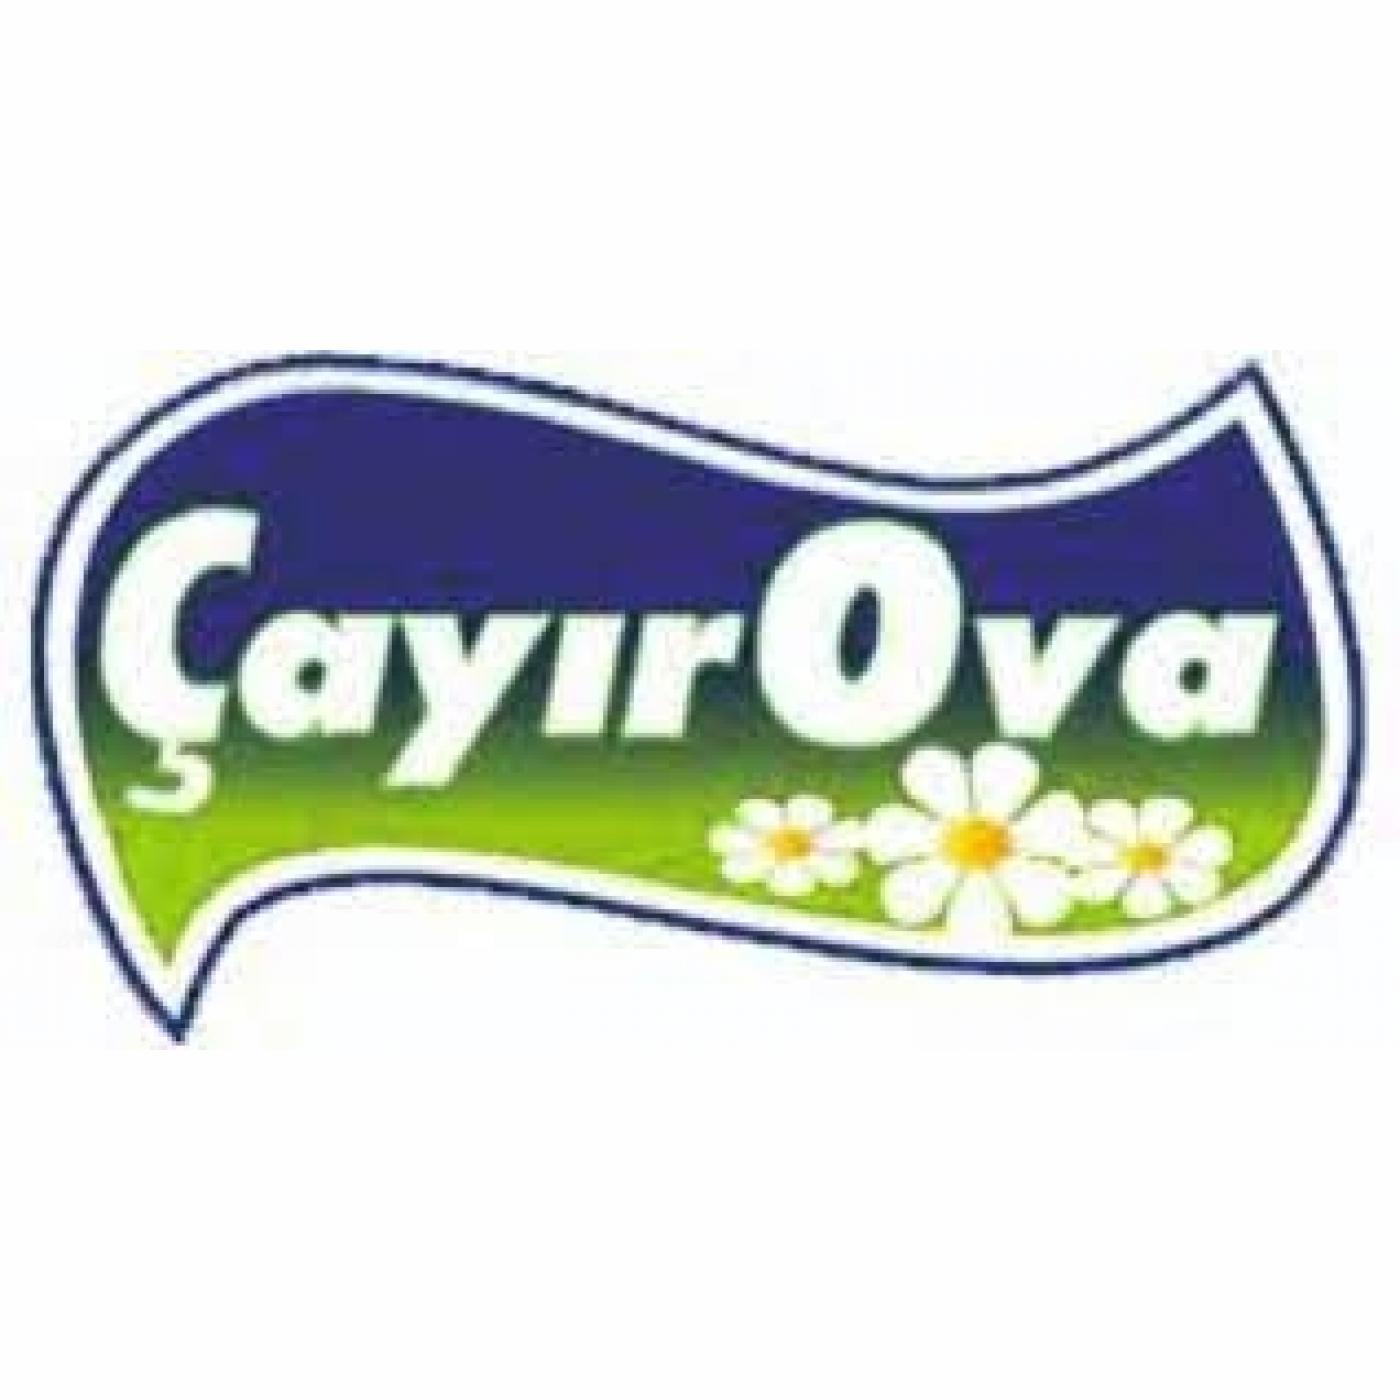 ÇAYIROVA YOĞURT 1,5KG TAVA